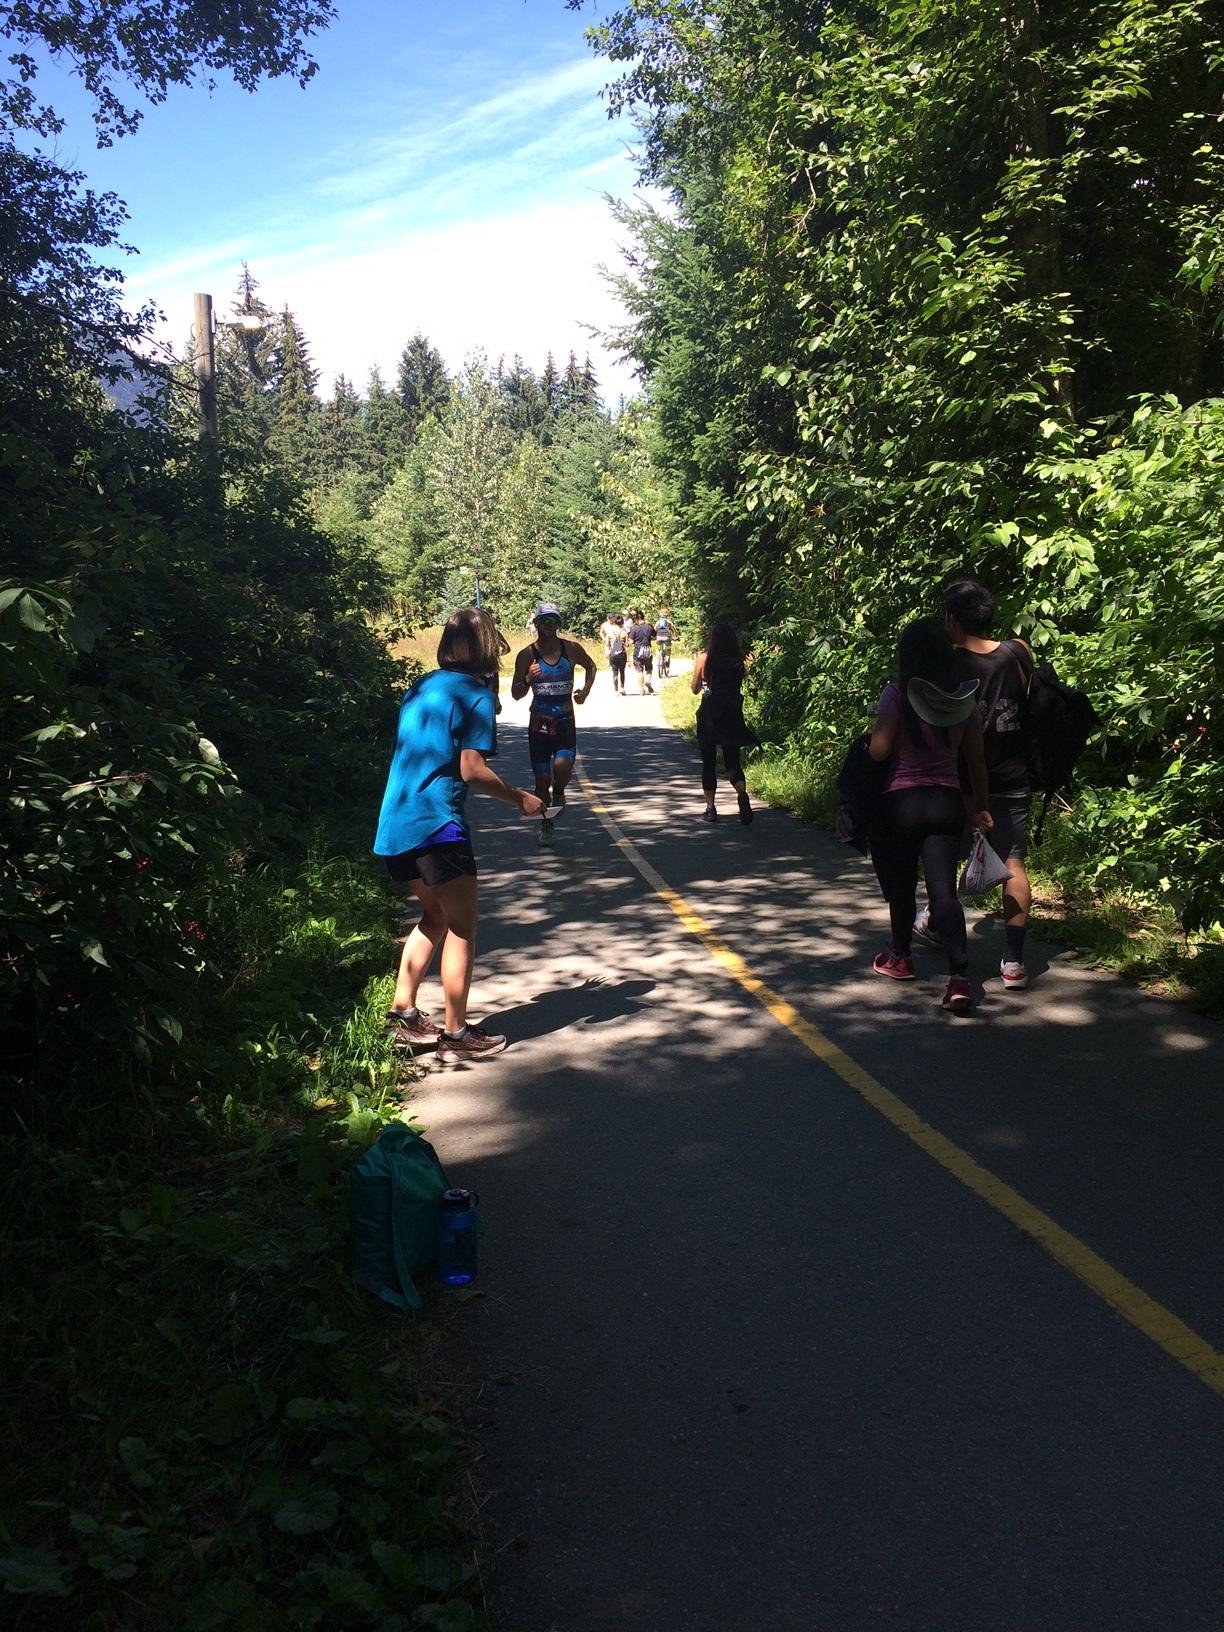 About 1-2K into the marathon.